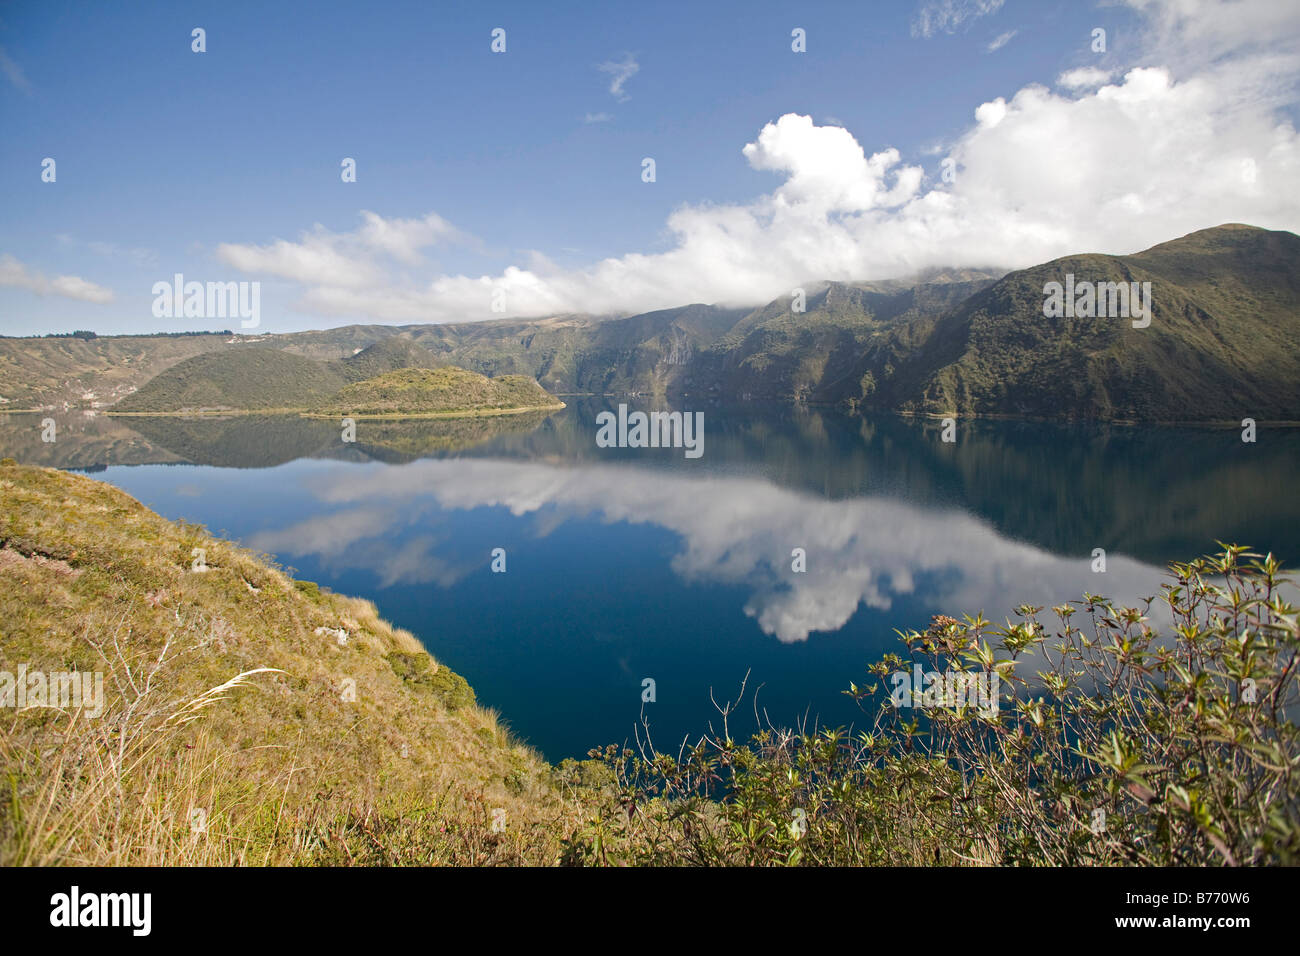 Cuicocha caldera and Crater lake at the foot of Cotacatchi Volcano in the Cordillera Occidental of Ecuadorian Andes. Stock Photo